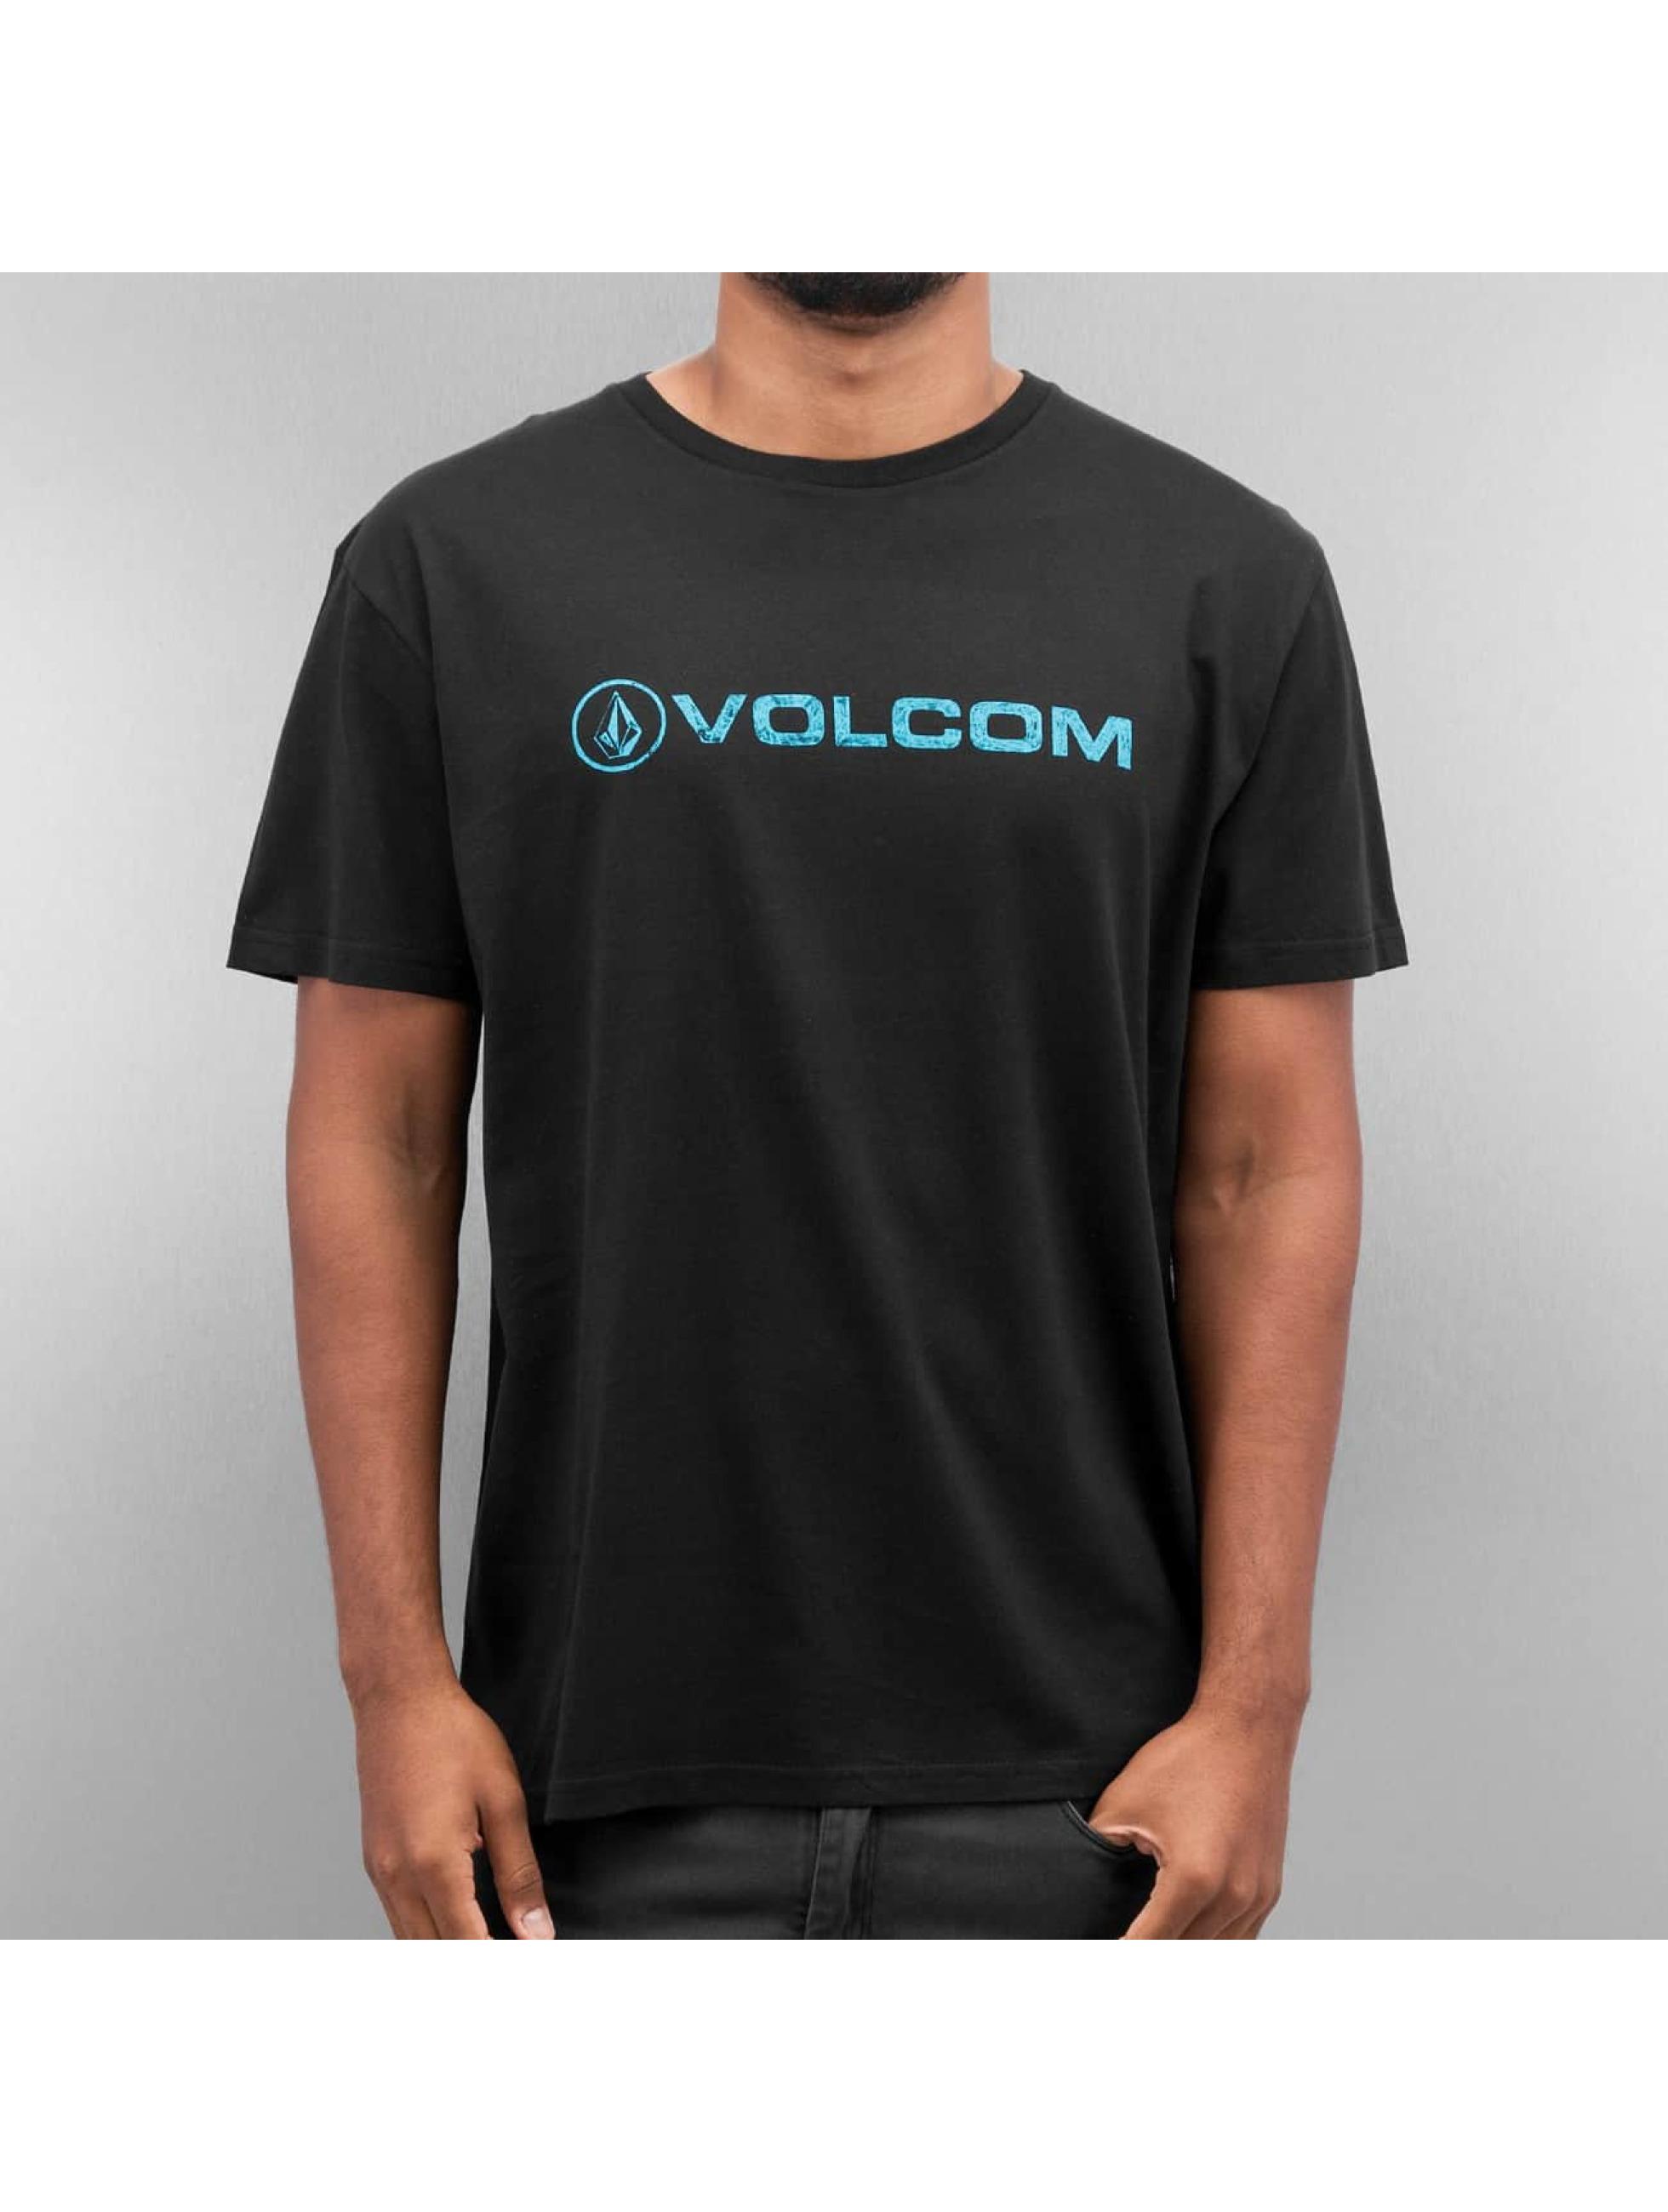 Volcom T-Shirt Euro Pencil black